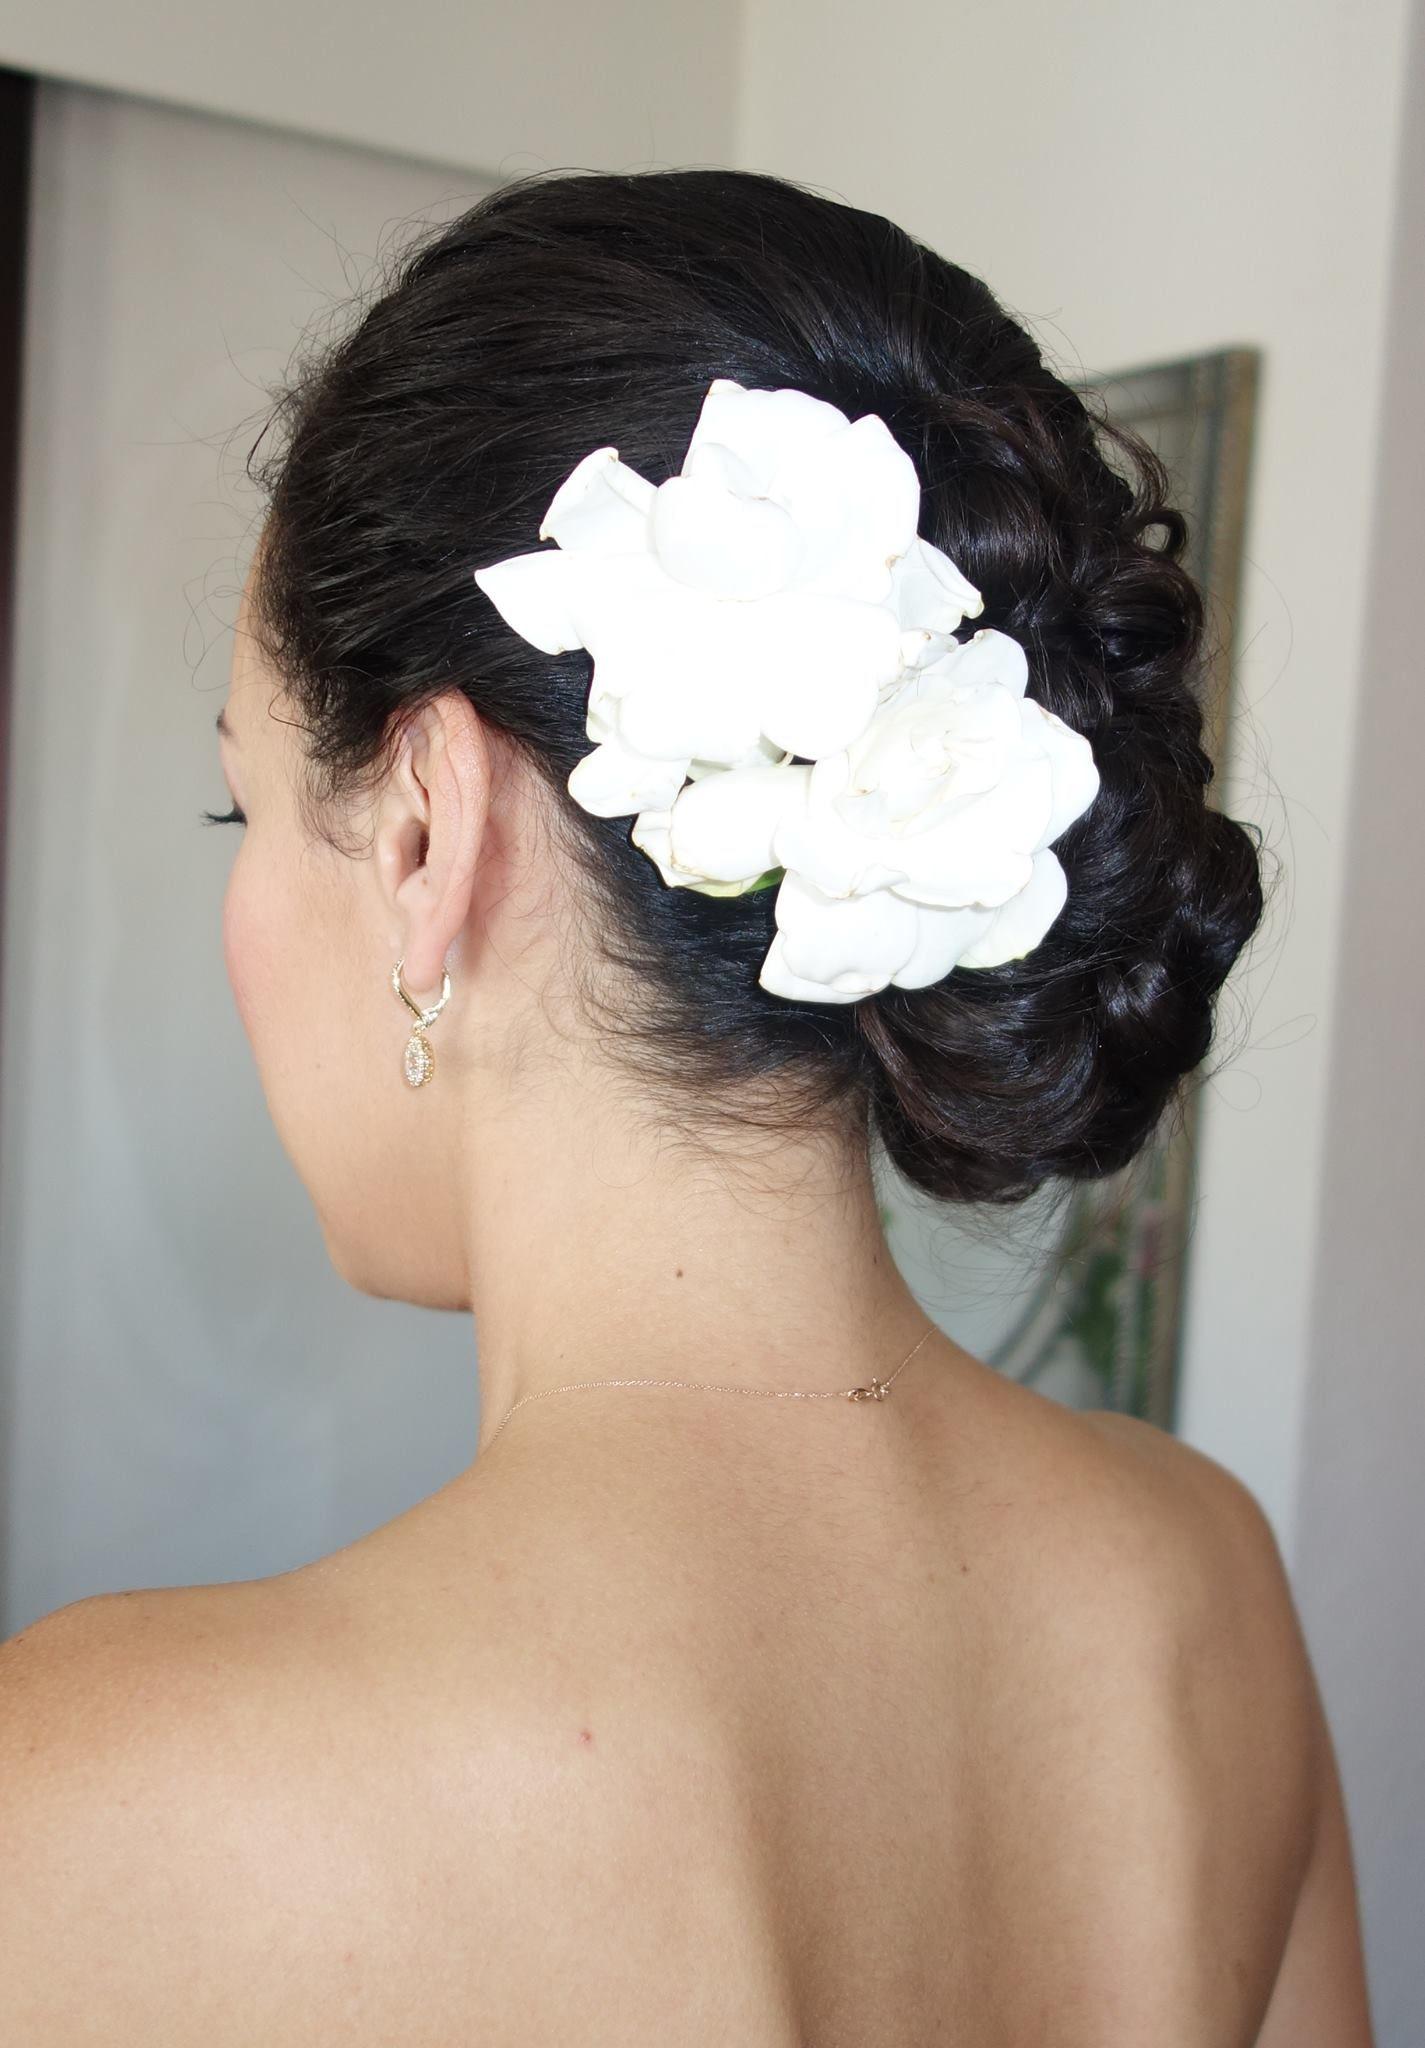 Bridal Hair and Makeup-Fresh Face Makeup www.freshfacemakeup.com https://www.facebook.com/freshfacemakeup http://www.yelp.com/biz/fresh-face-makeup-san-francisco